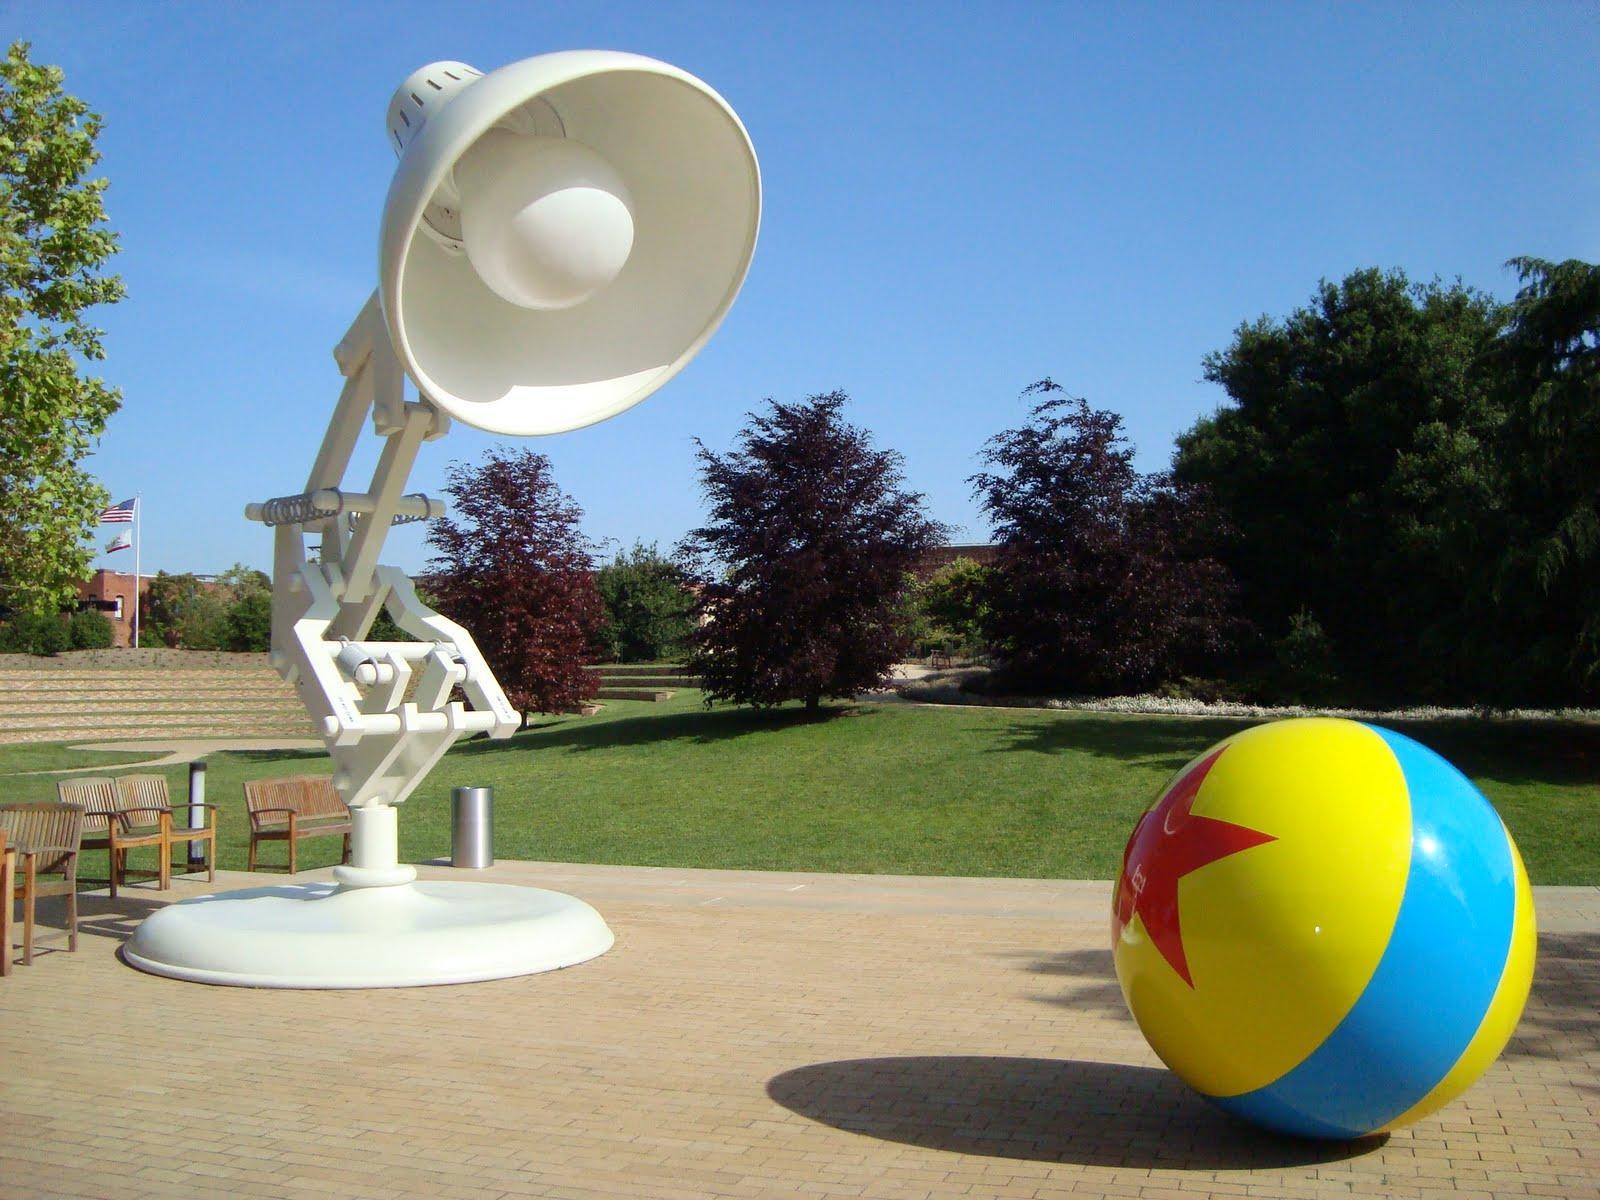 Pixar Corner My Visit To Pixar The Studio Grounds